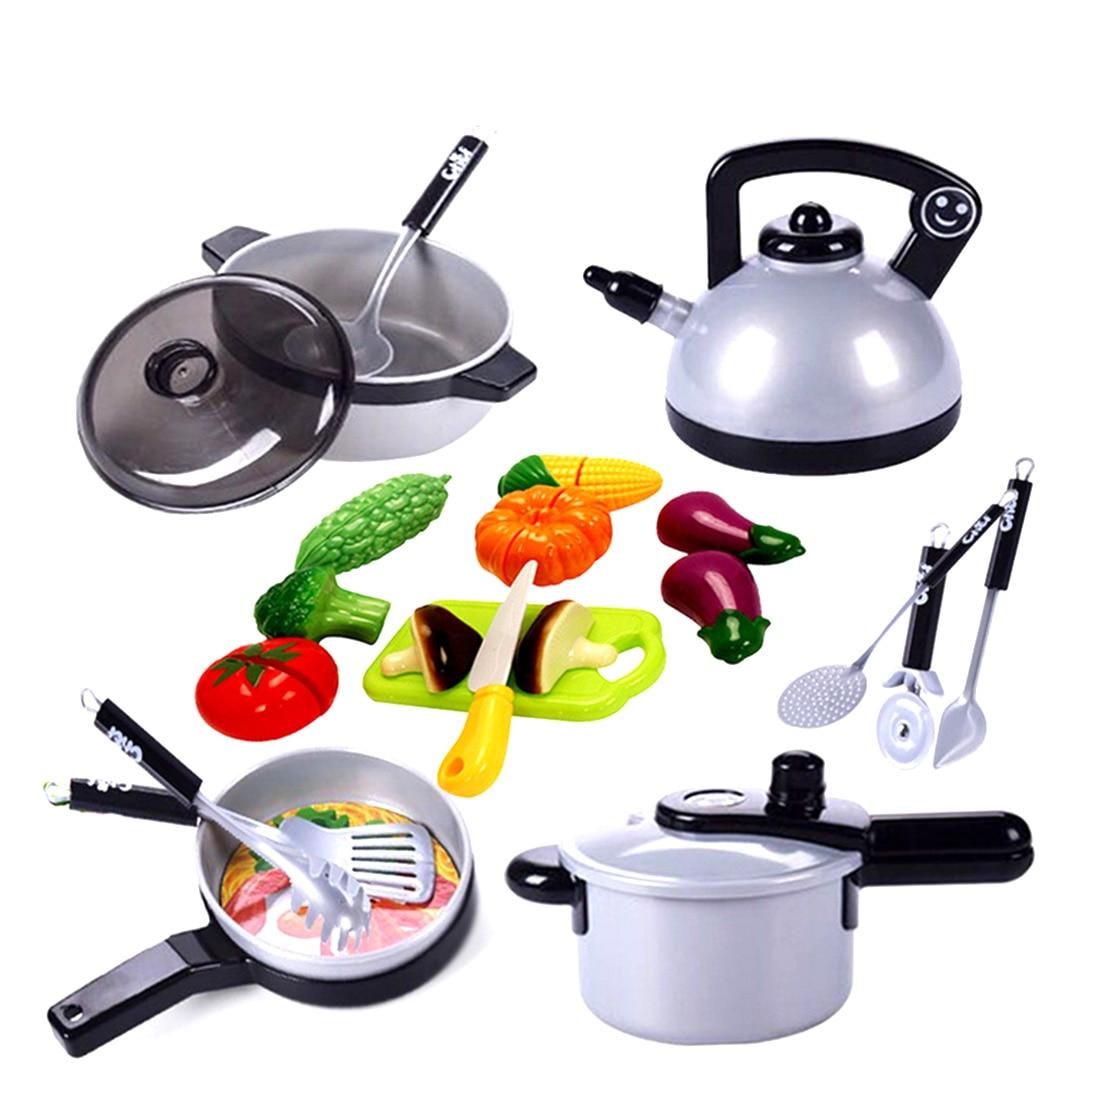 Surwish Children Cooking Kitchen Toys Pretend & Play Game Early Educational Gift Fun Toy Set салатники fun kitchen